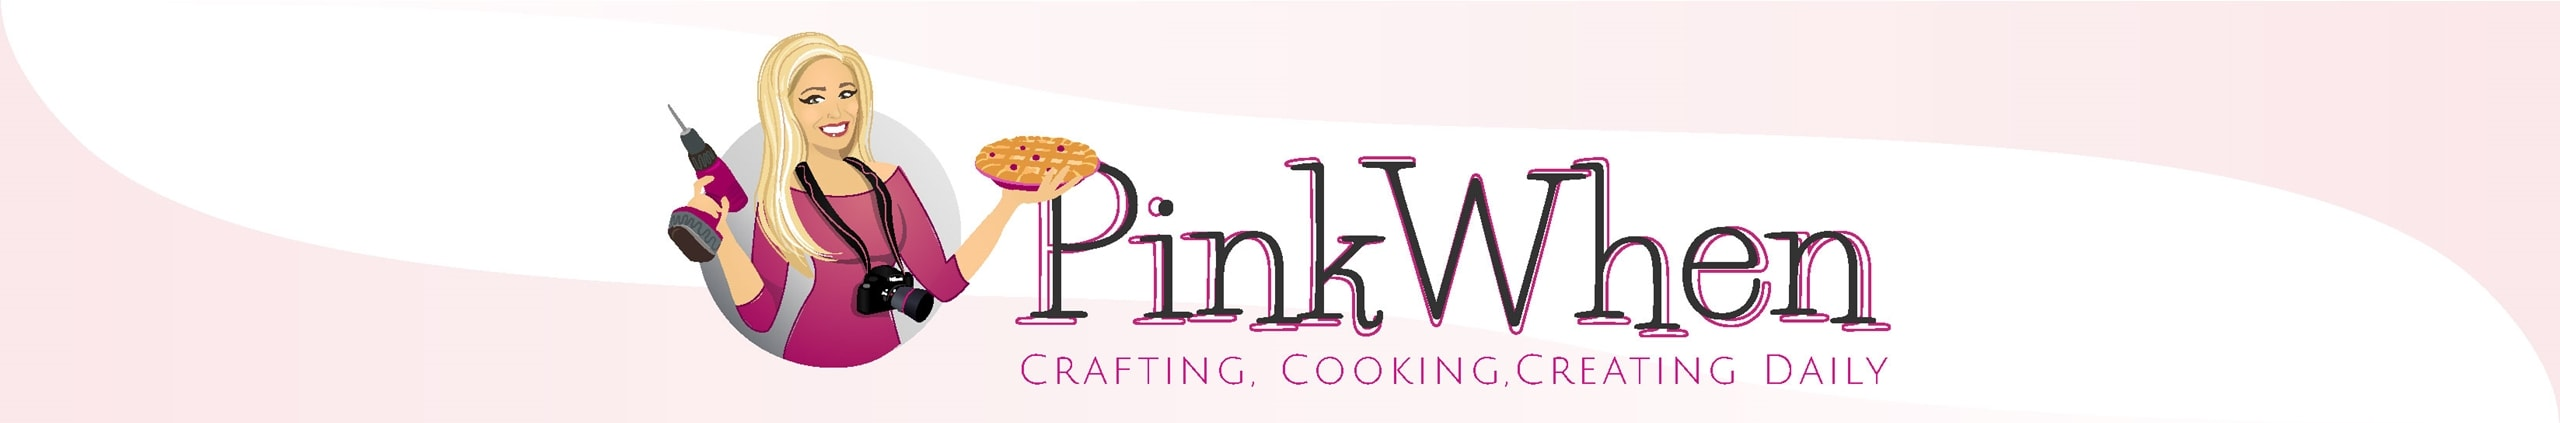 pinkwhen.com